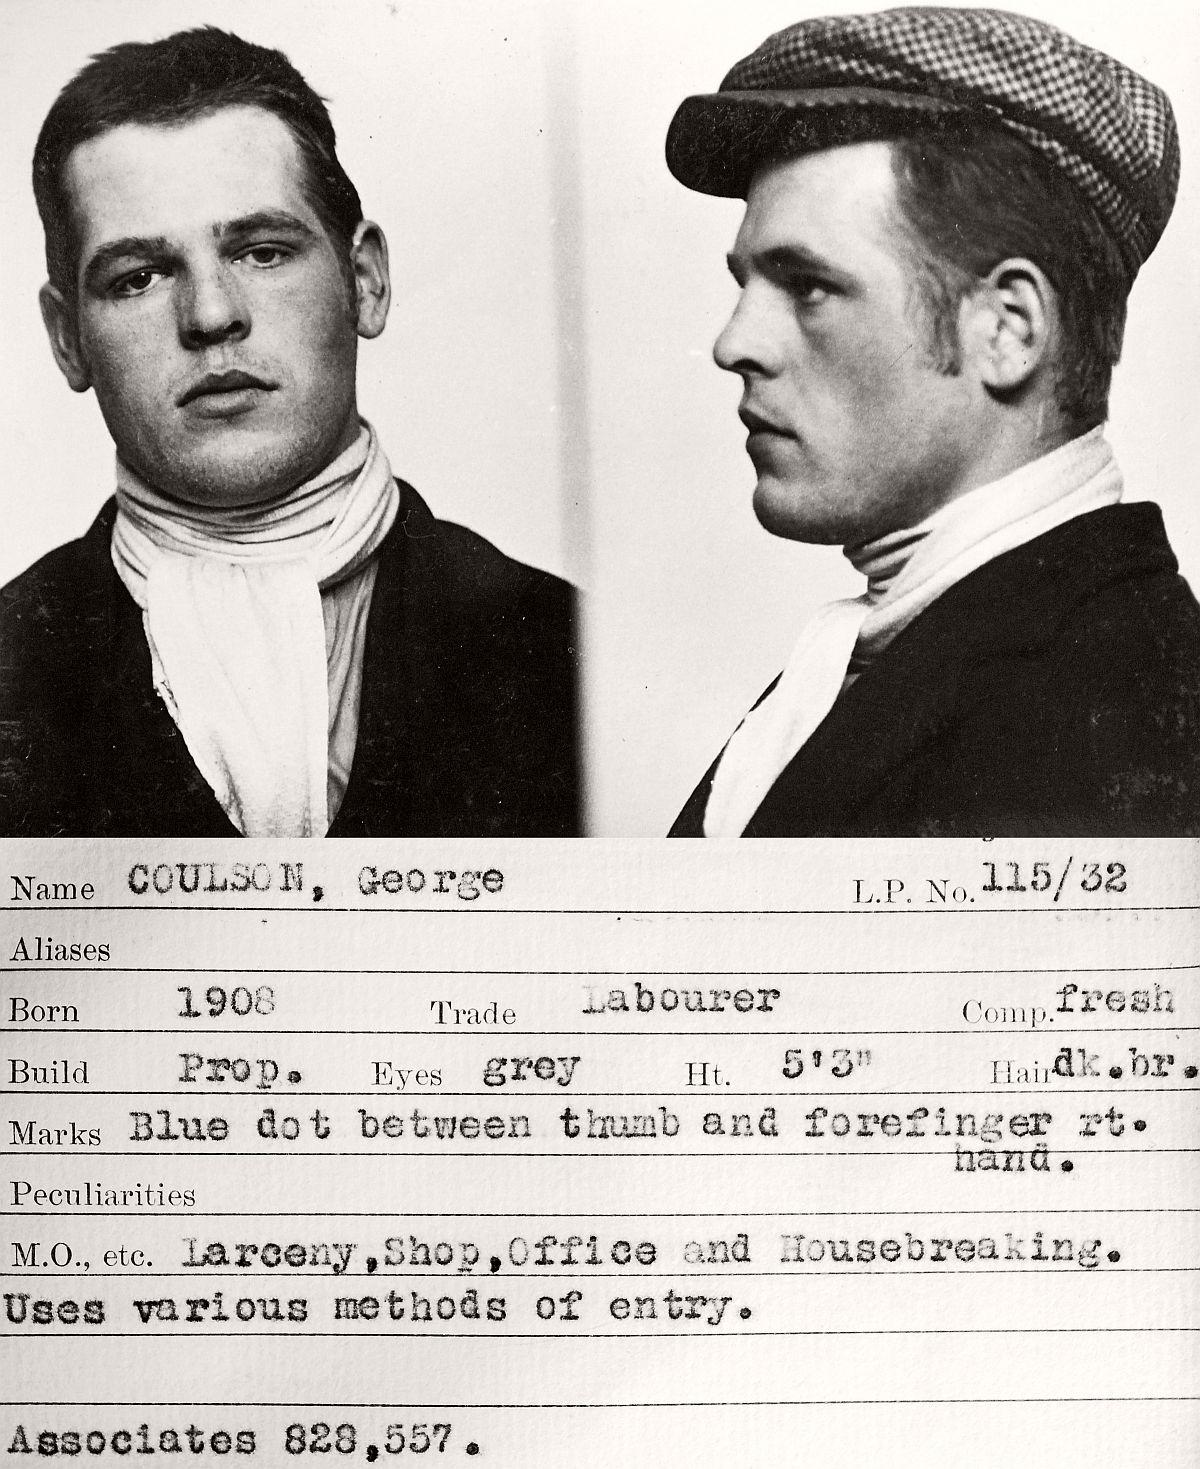 vintage-mug-shot-of-criminals-from-newcastle-upon-tyne-1930s-05